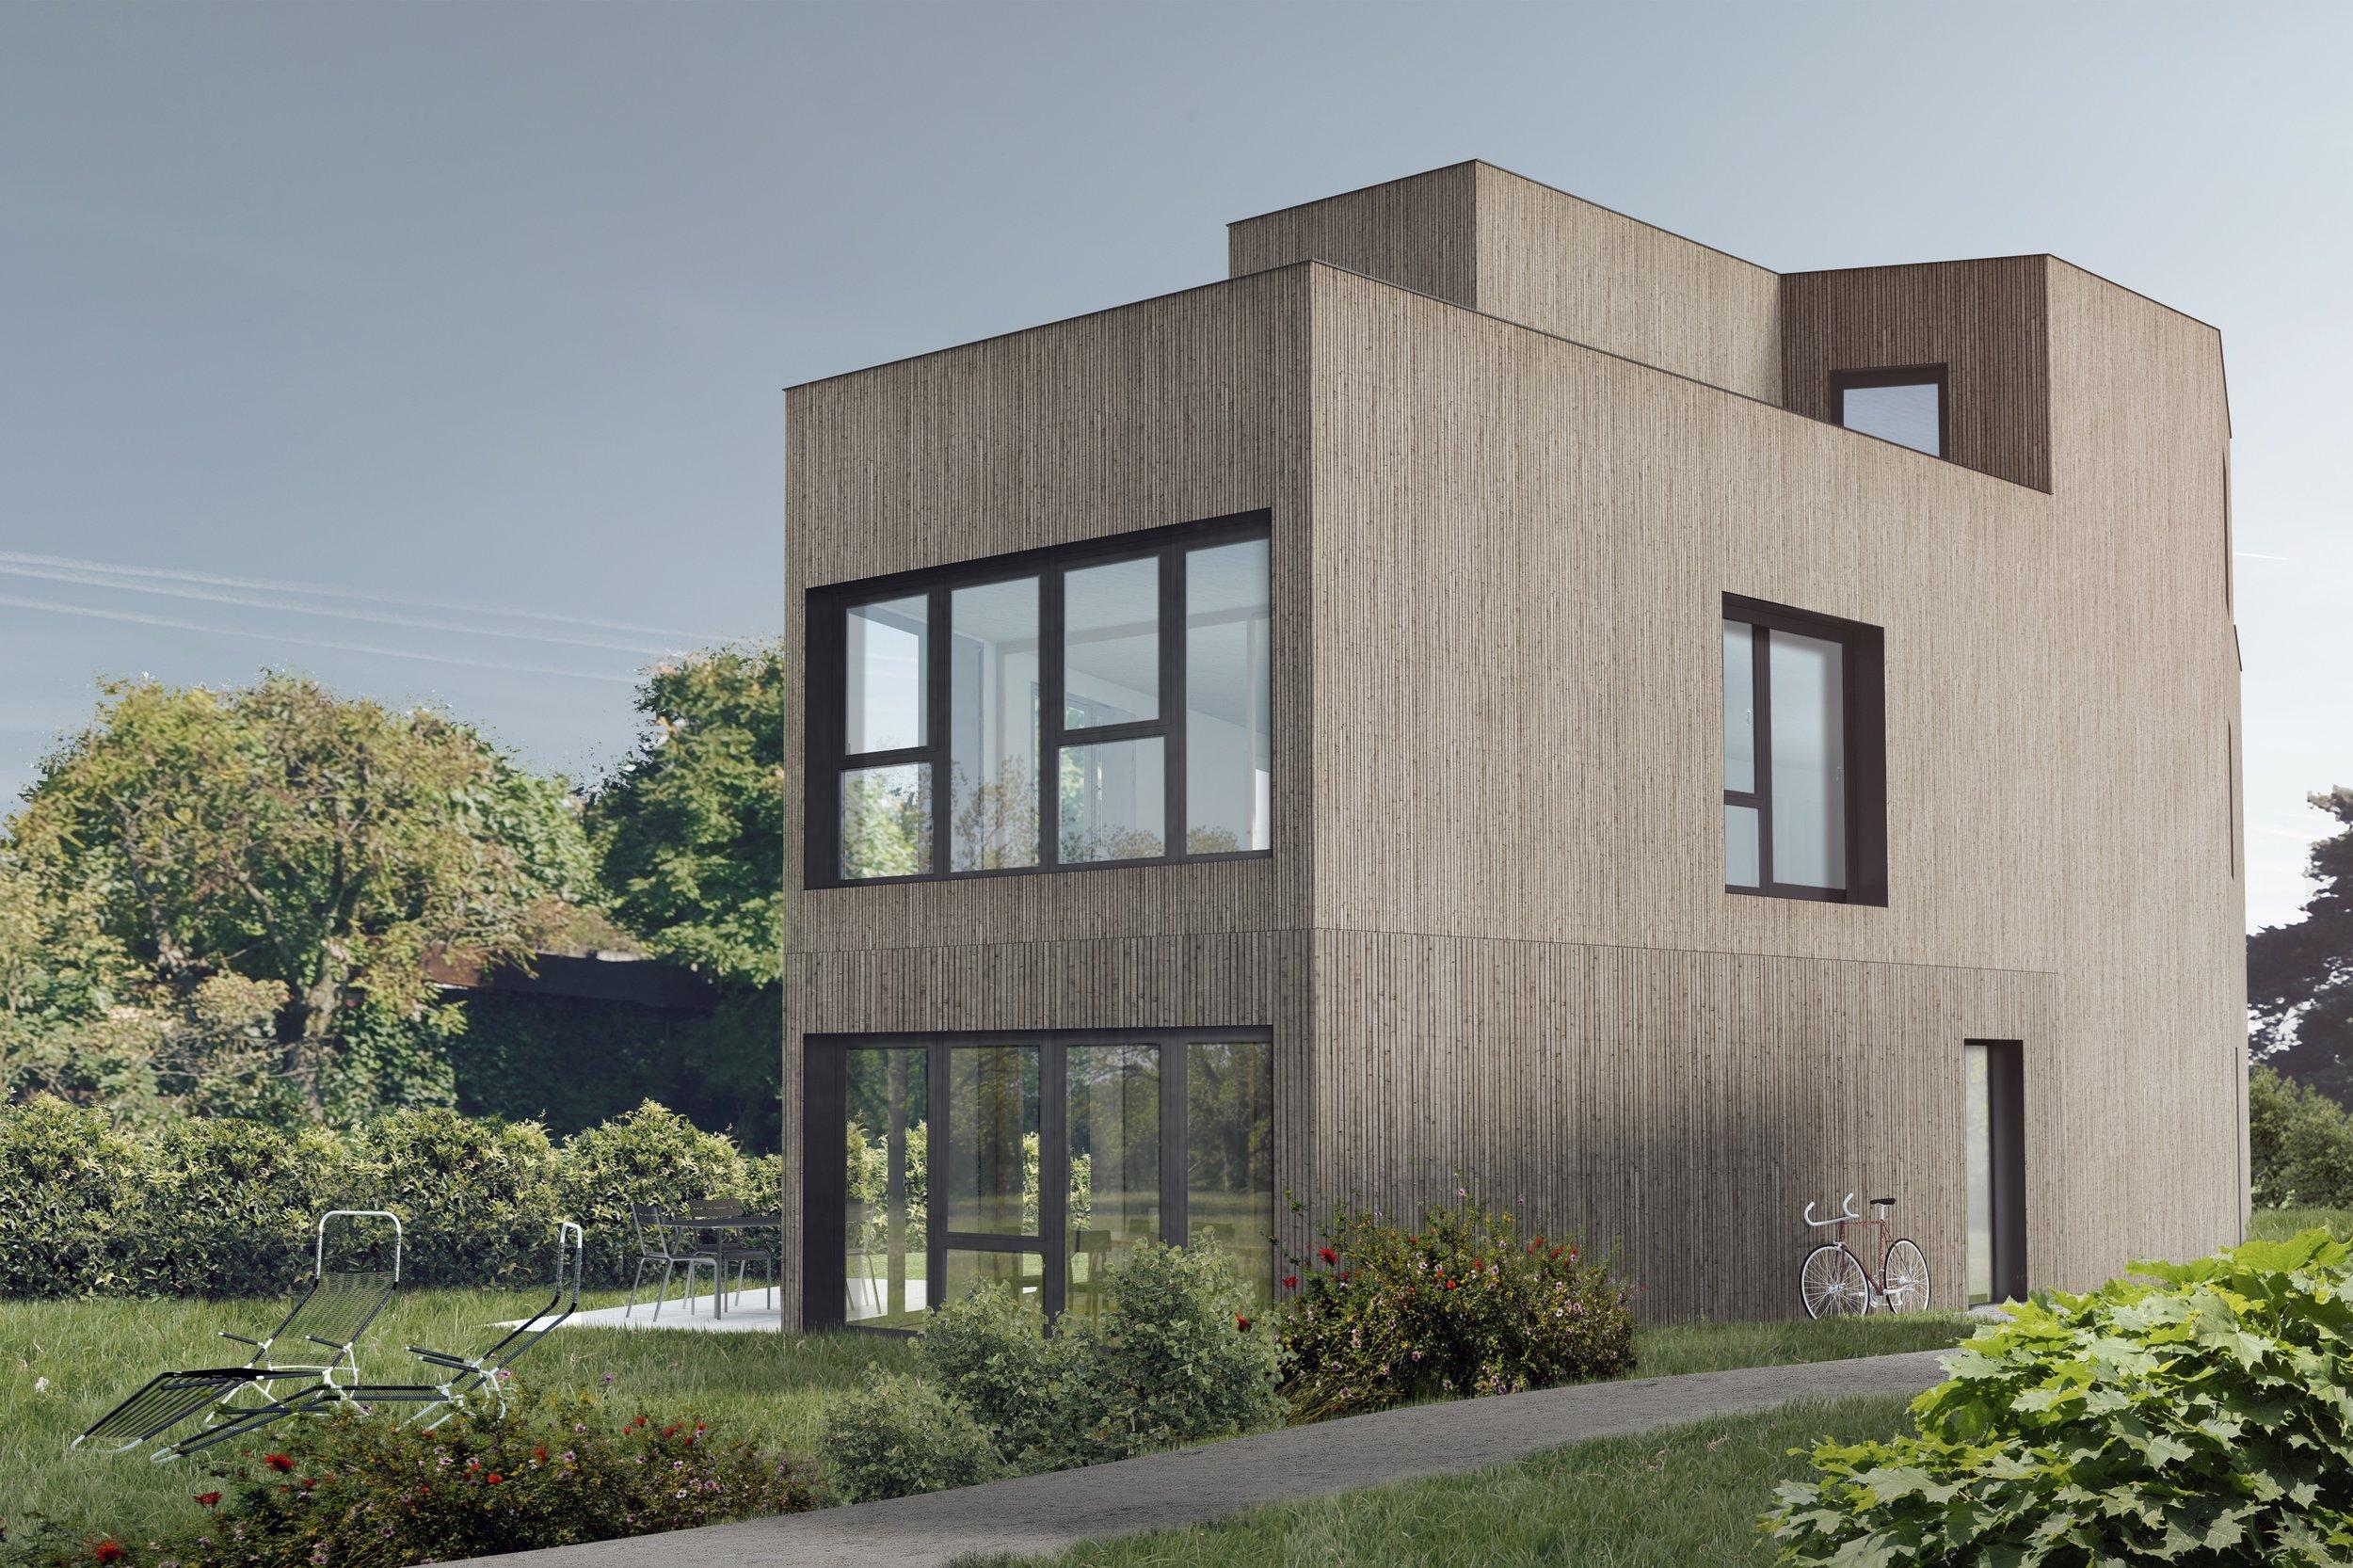 Doppelhaus_Bild_02.jpg